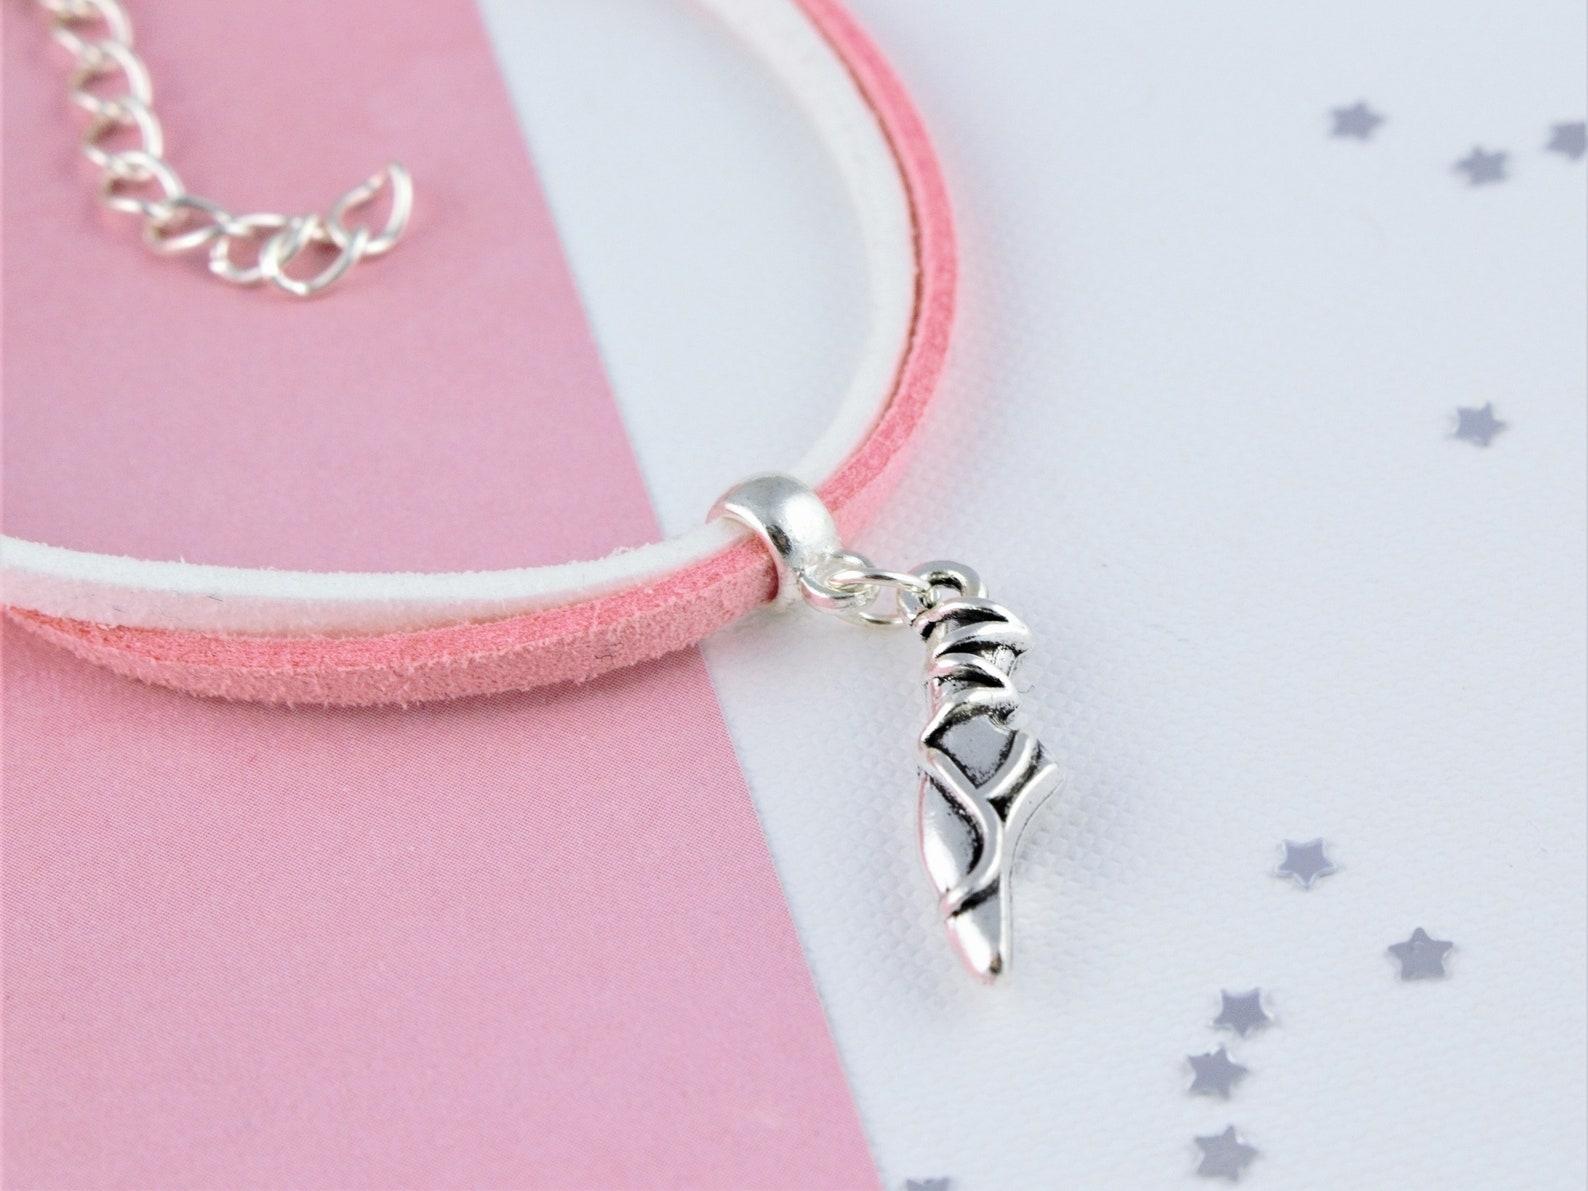 ballerina cord bracelet, suede bracelet, ballet shoe jewellery, soft bracelet, kid's bracelet, lightweight bracelet, girls d